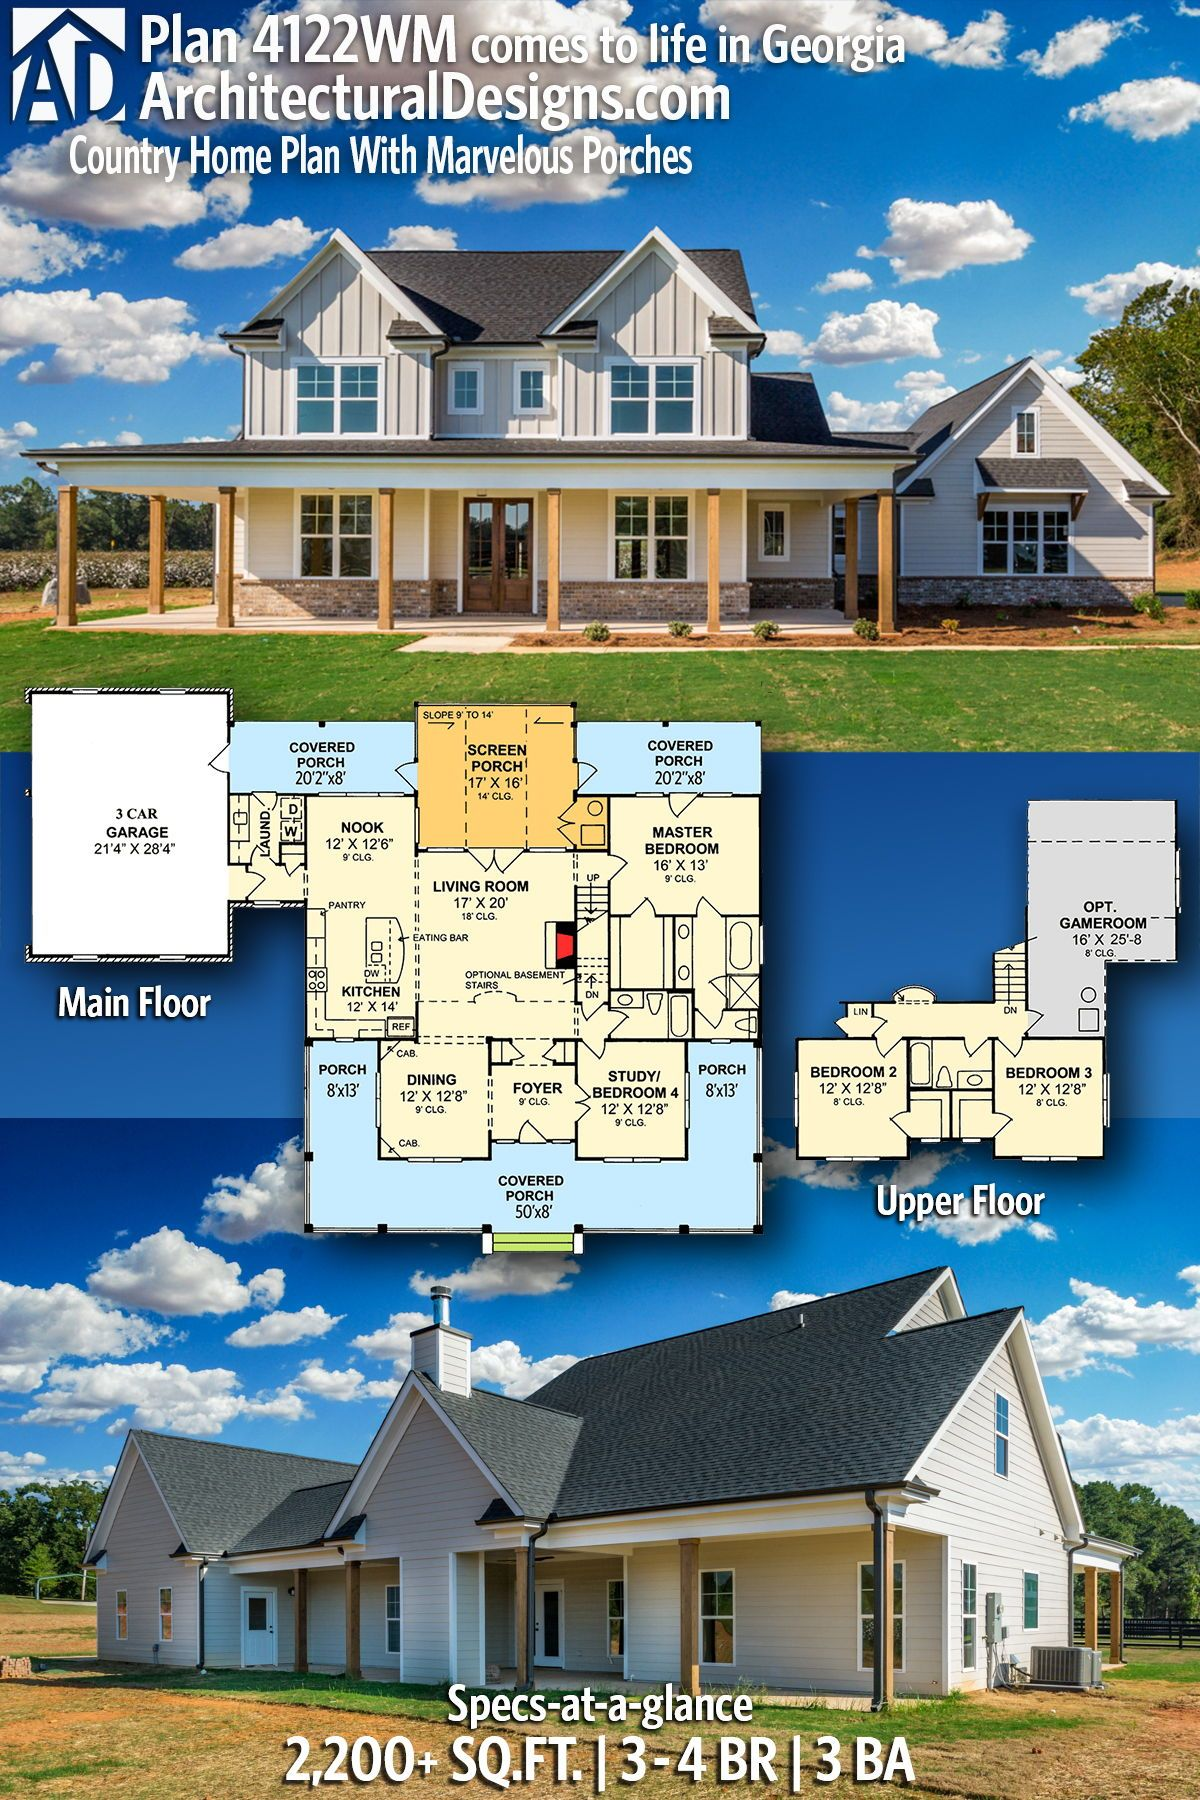 Architectural Designs House Plan 4122WM client built in